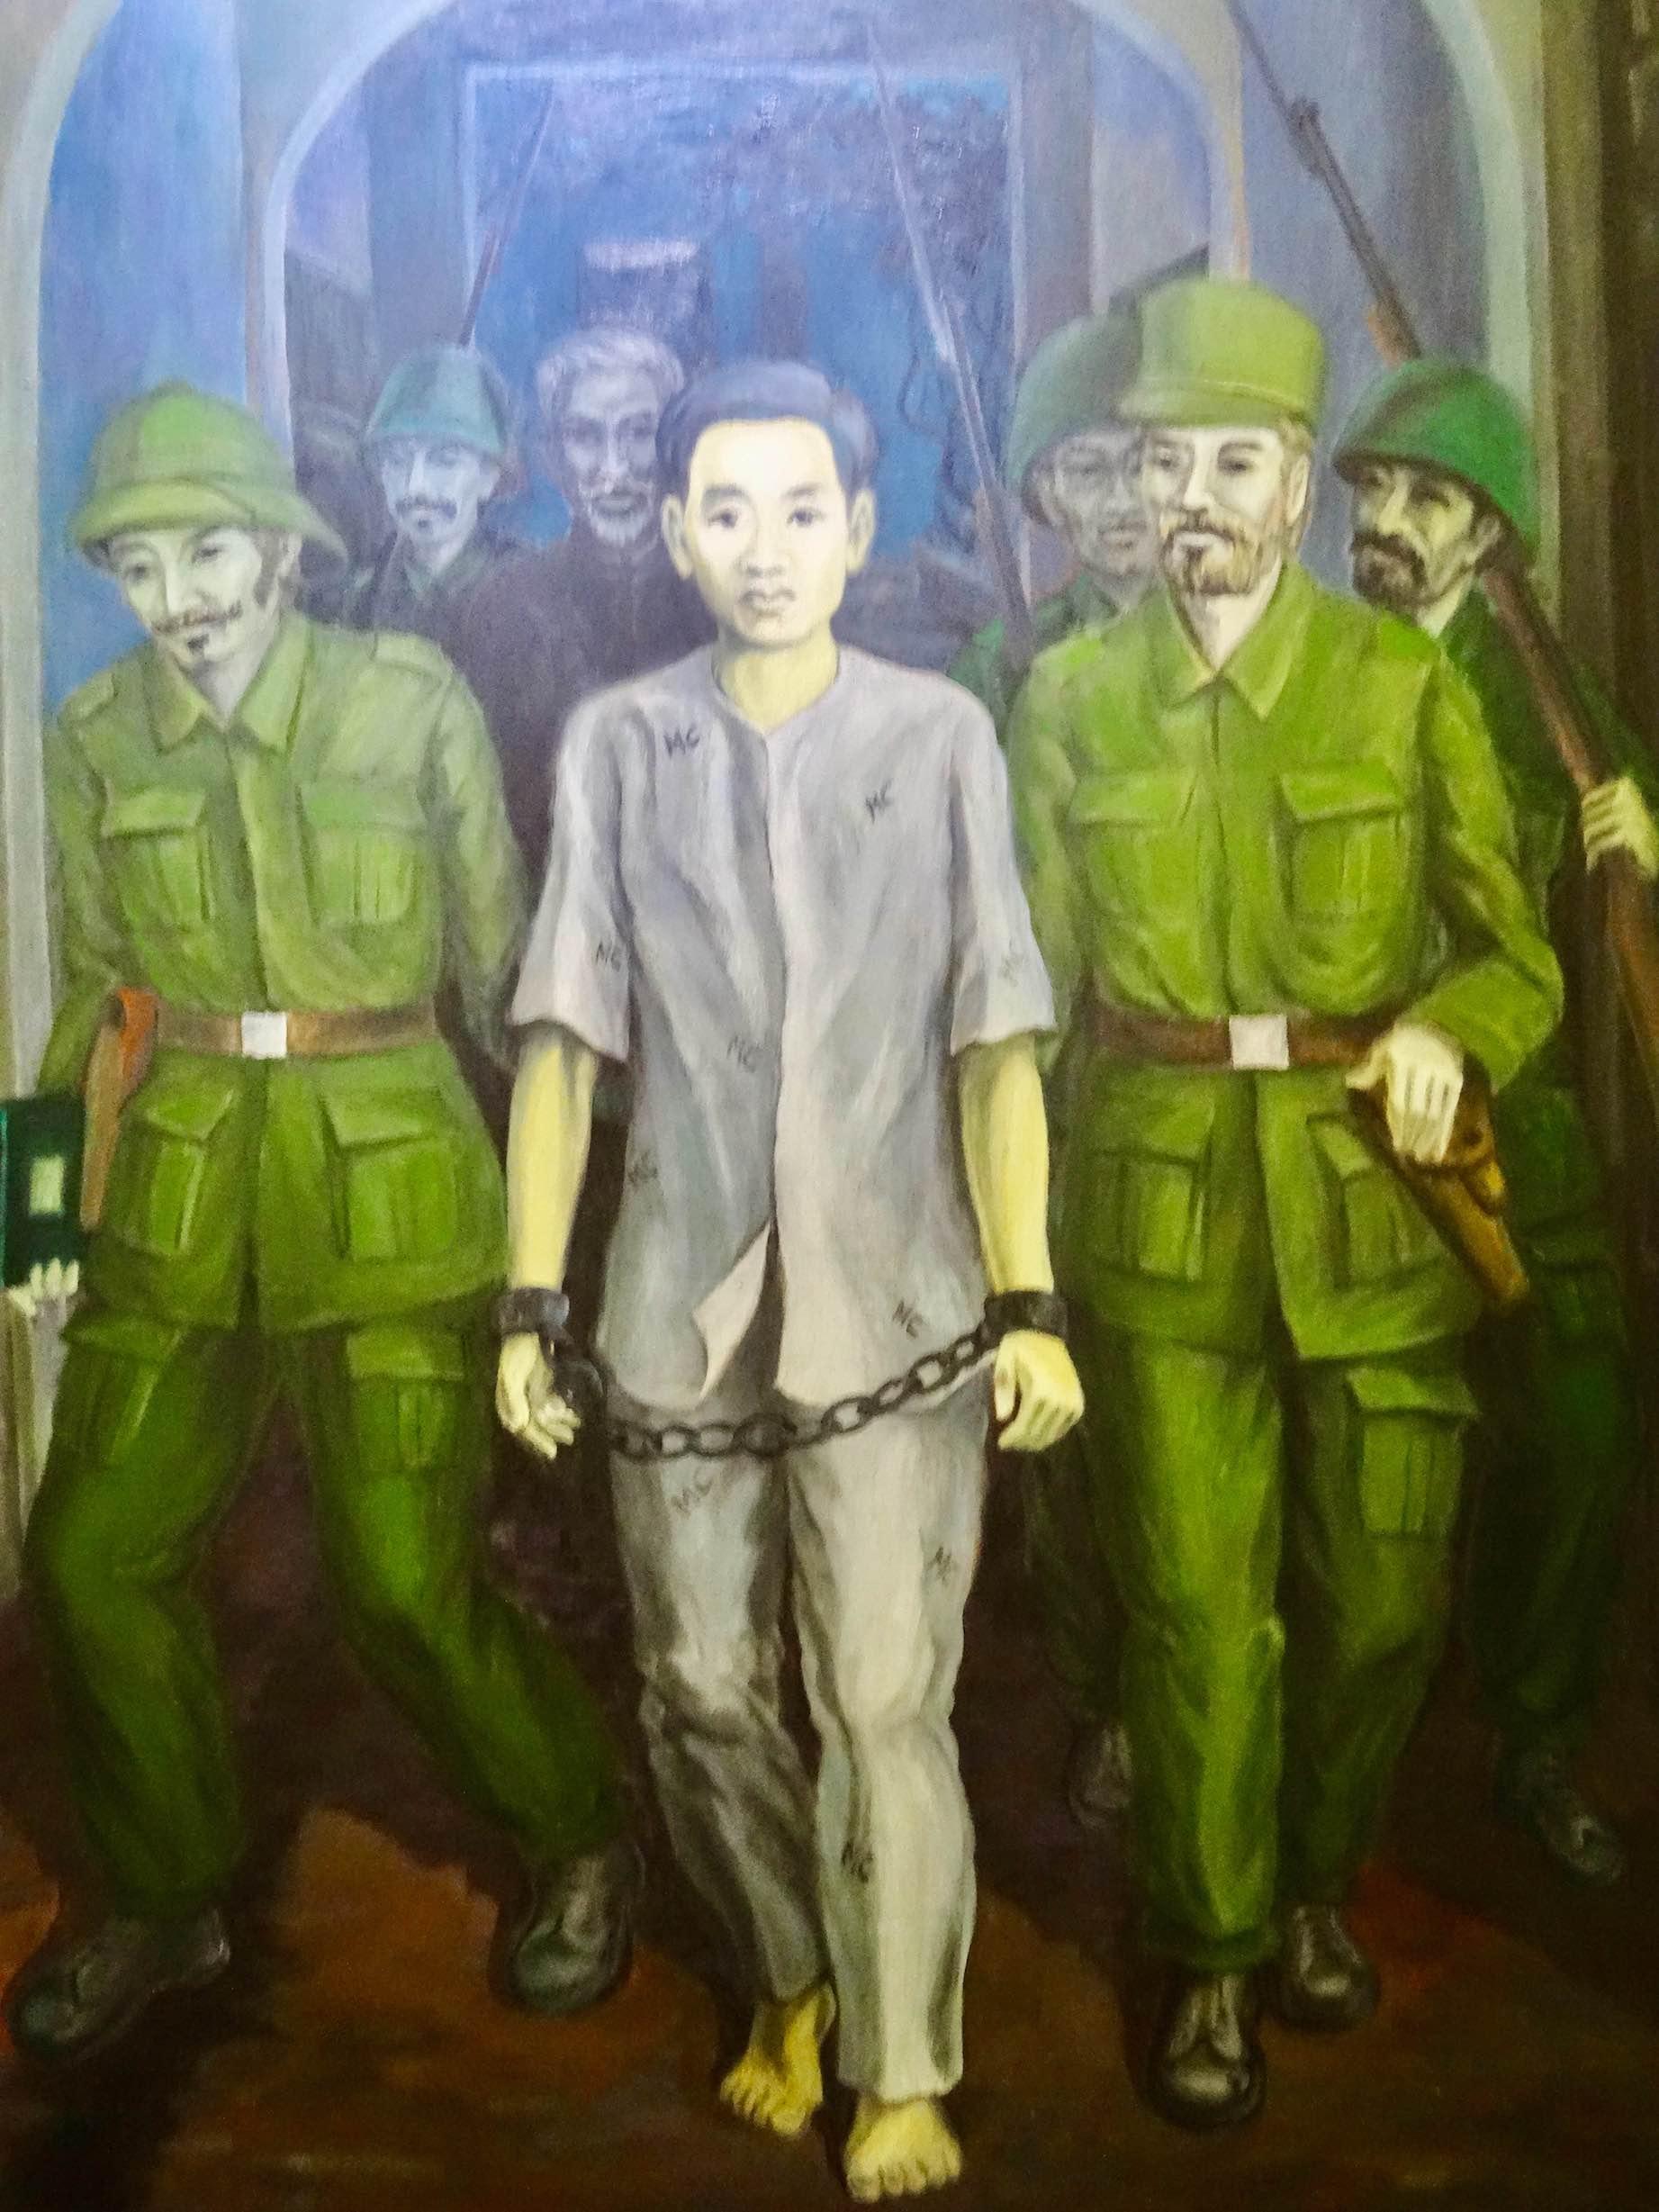 Political prisoner painting Hoa Lo Prison